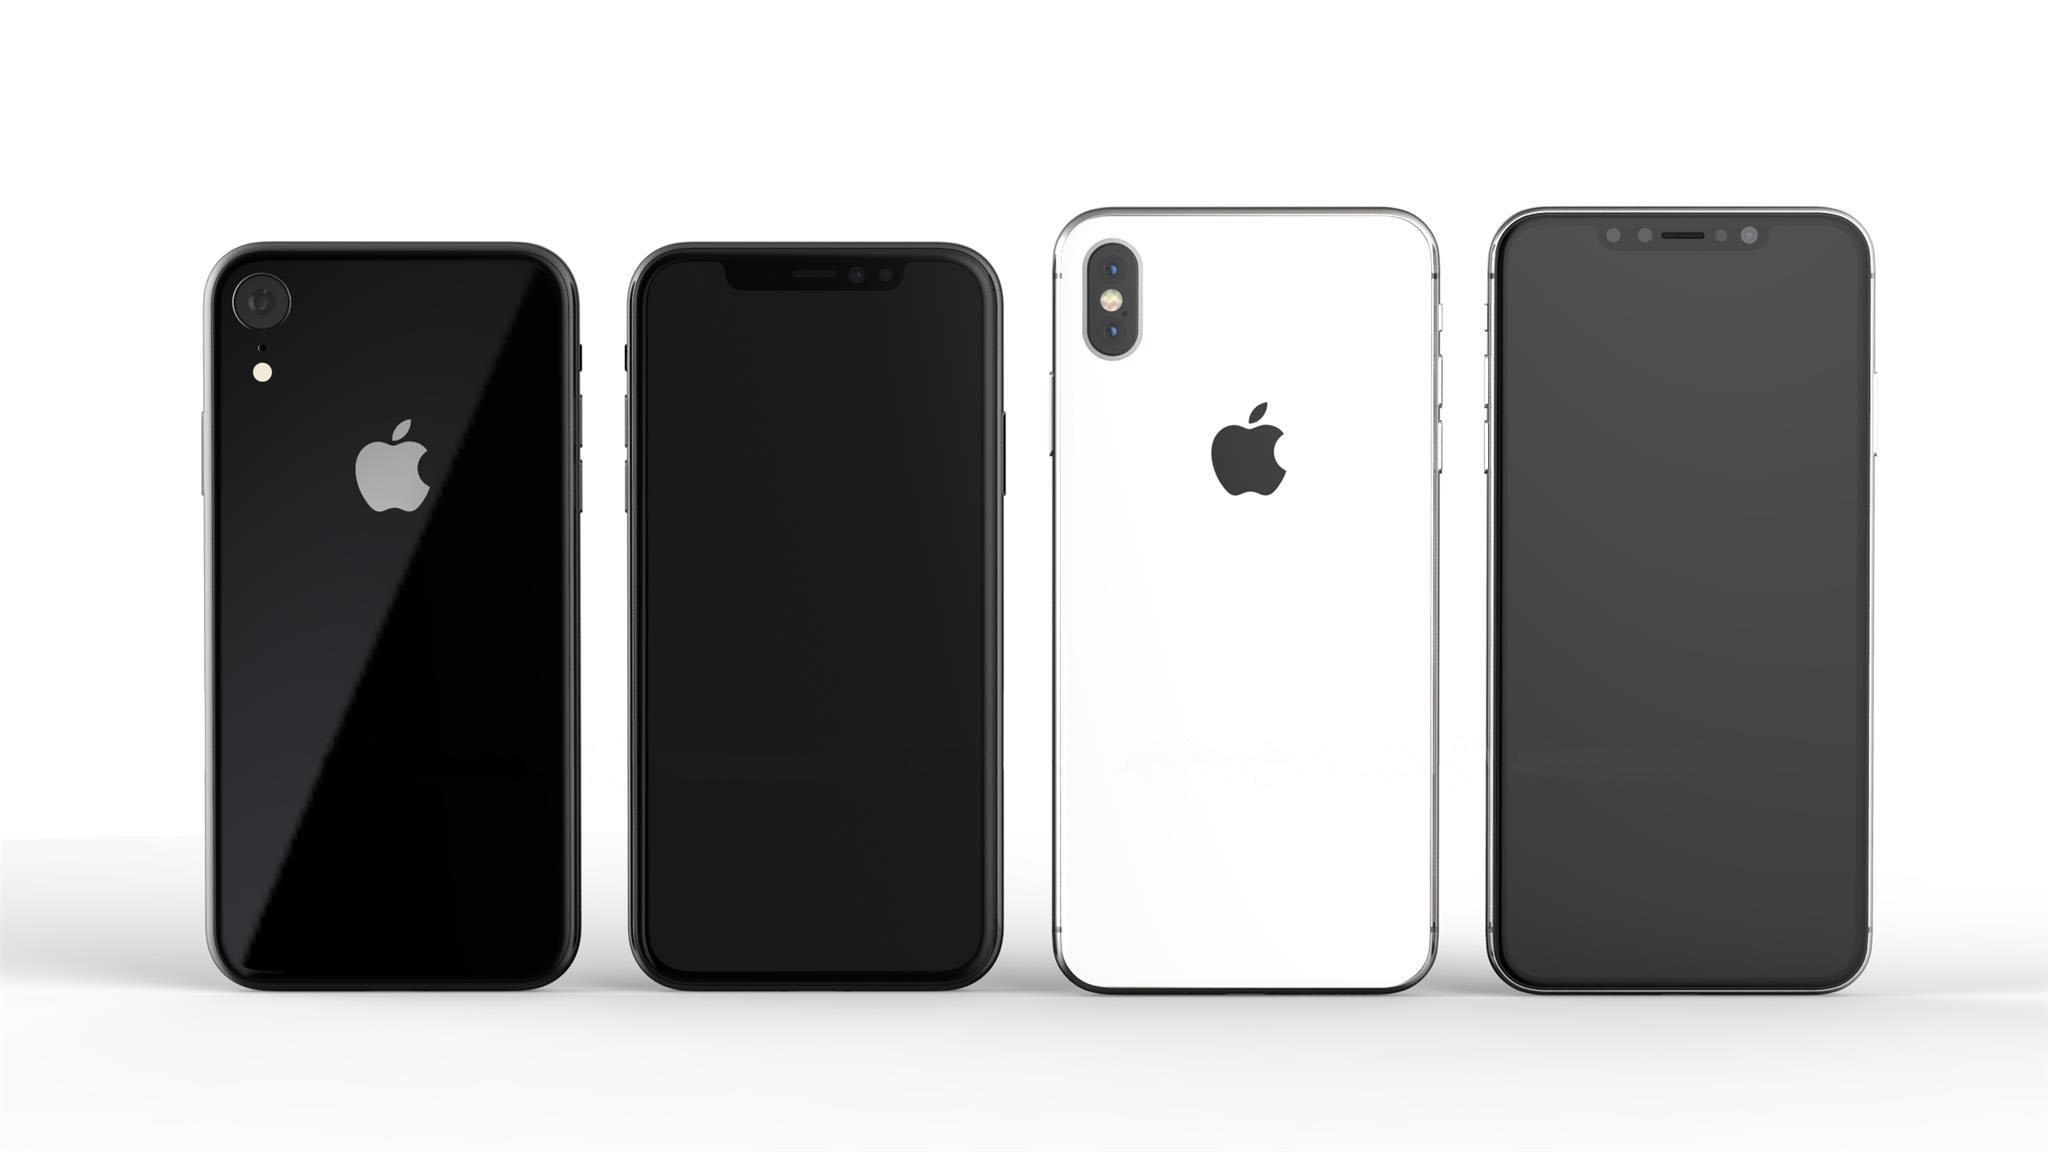 جوال iPhone X Plus و iPhone X Lite صور ثلاثية الأبعاد